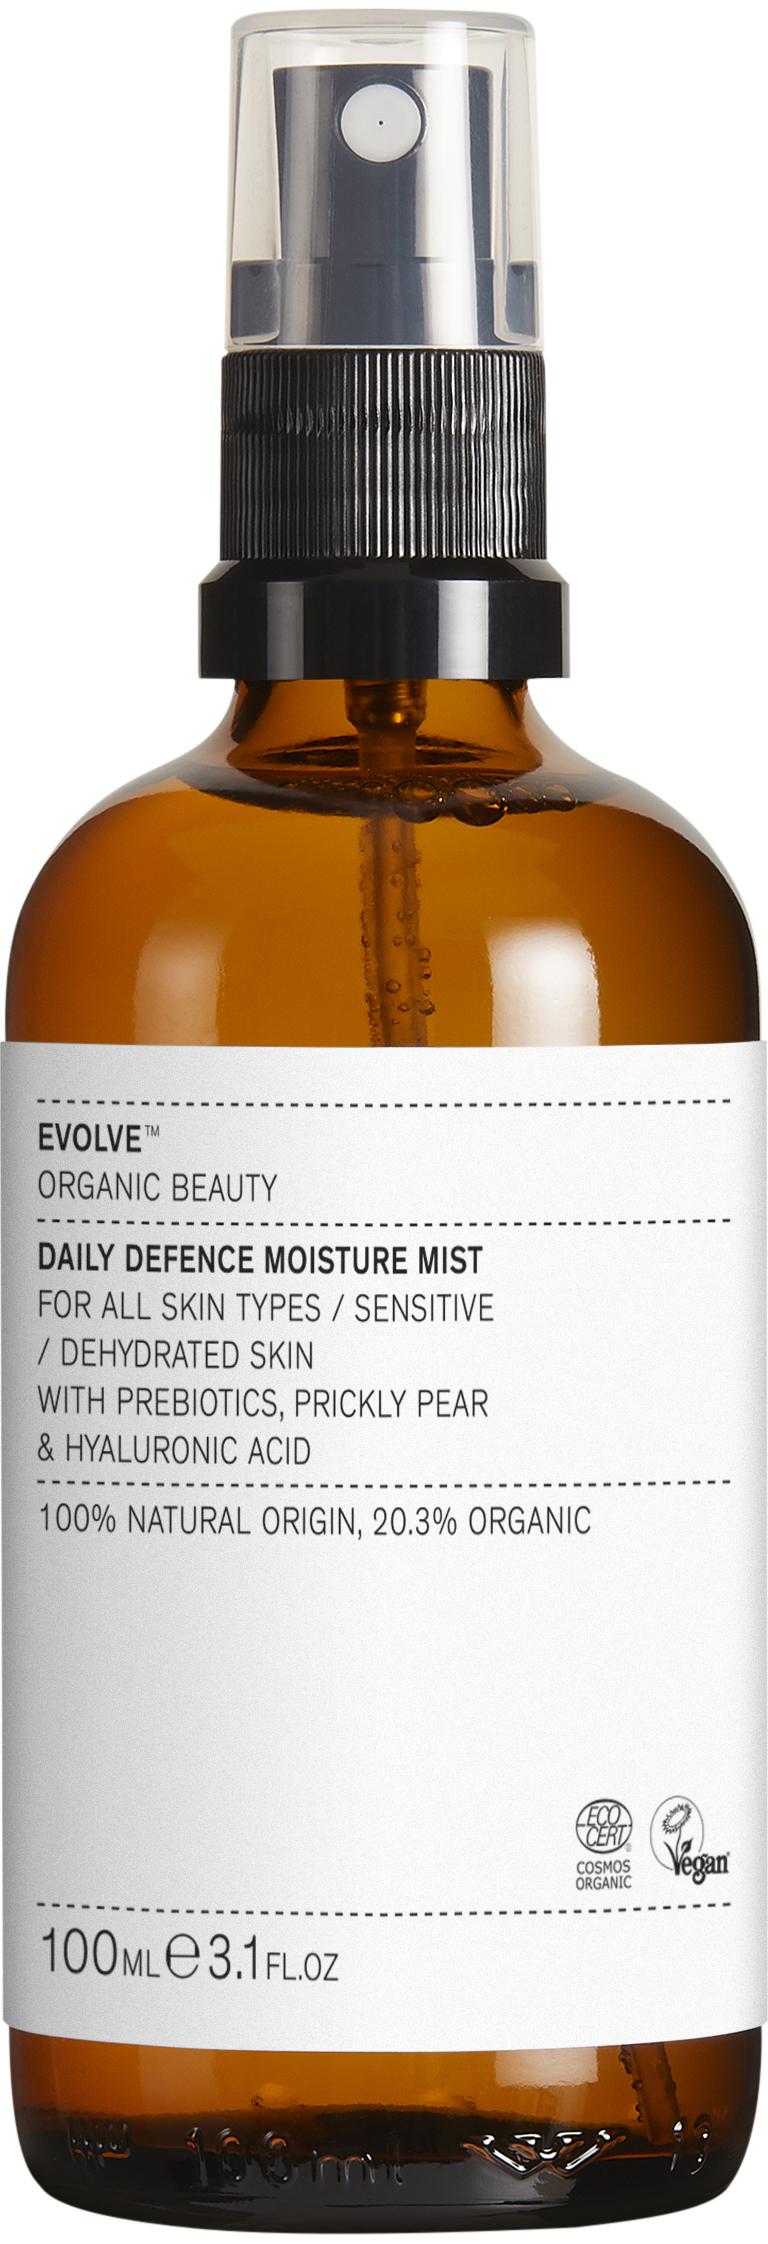 Evolve Daily Defence Moisture Mist, 100 ml